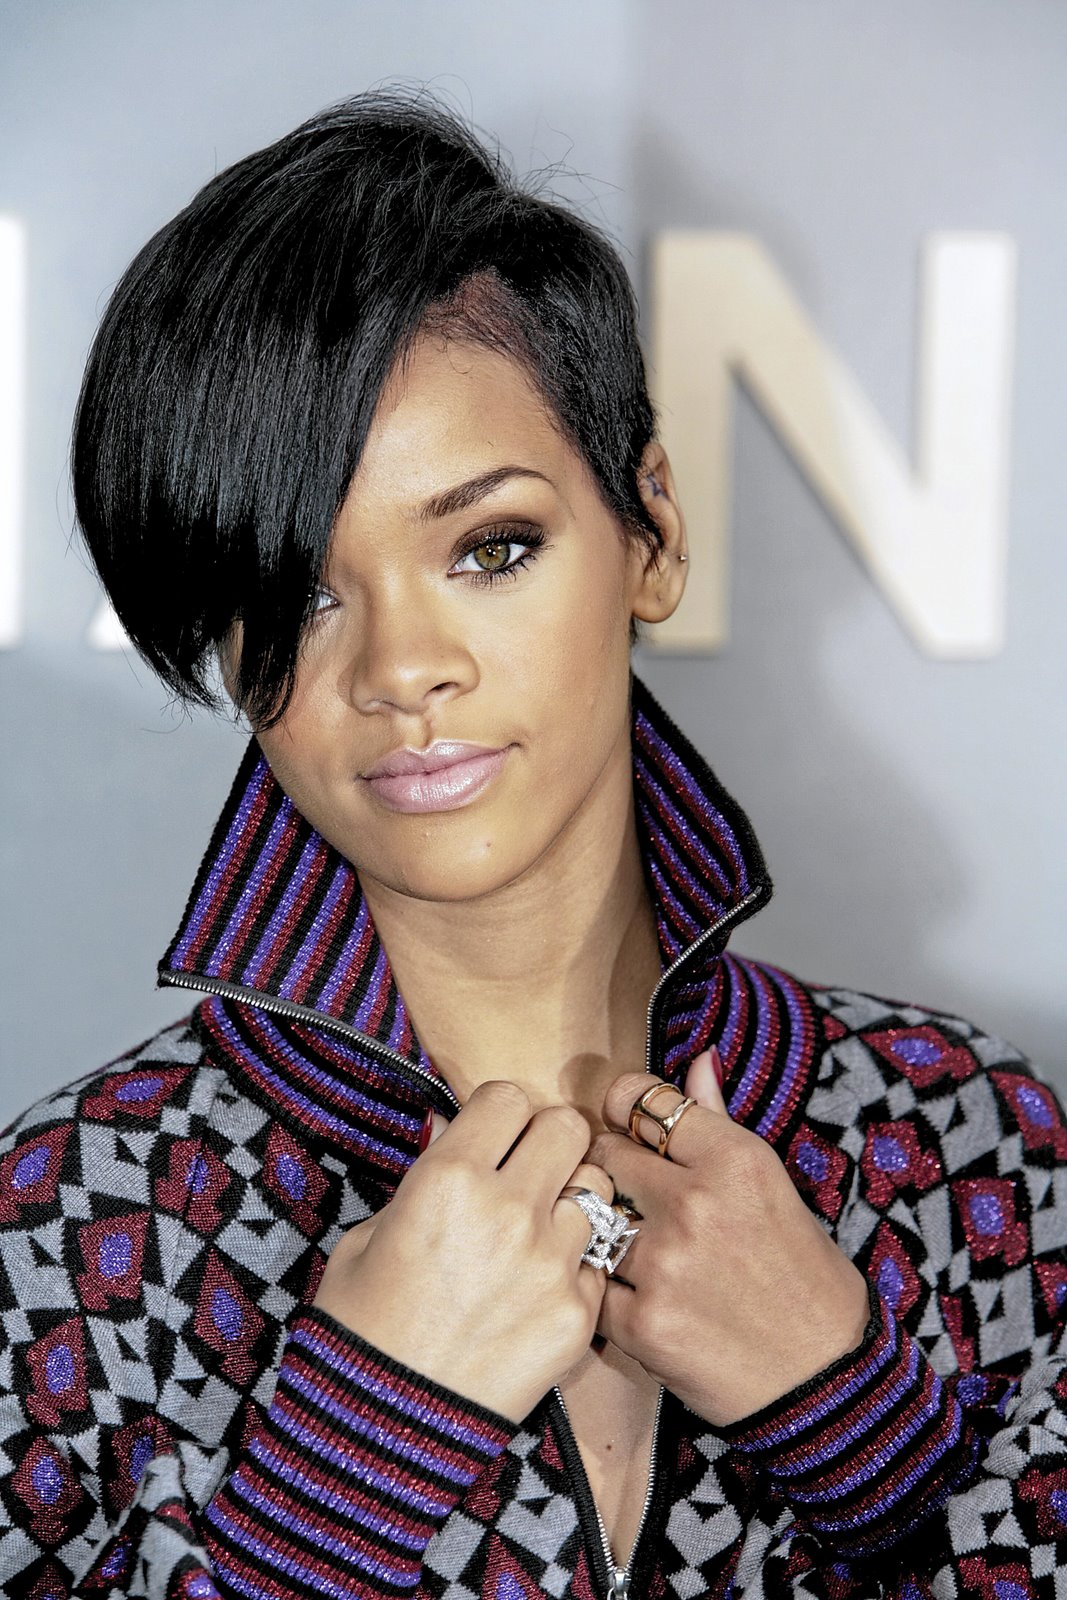 http://3.bp.blogspot.com/_uUR1DUyvNT4/TF6I0D7-h_I/AAAAAAAAAkM/5W5CTWHgPsU/s1600/Rihanna%20-%20Black%20Hair.jpg